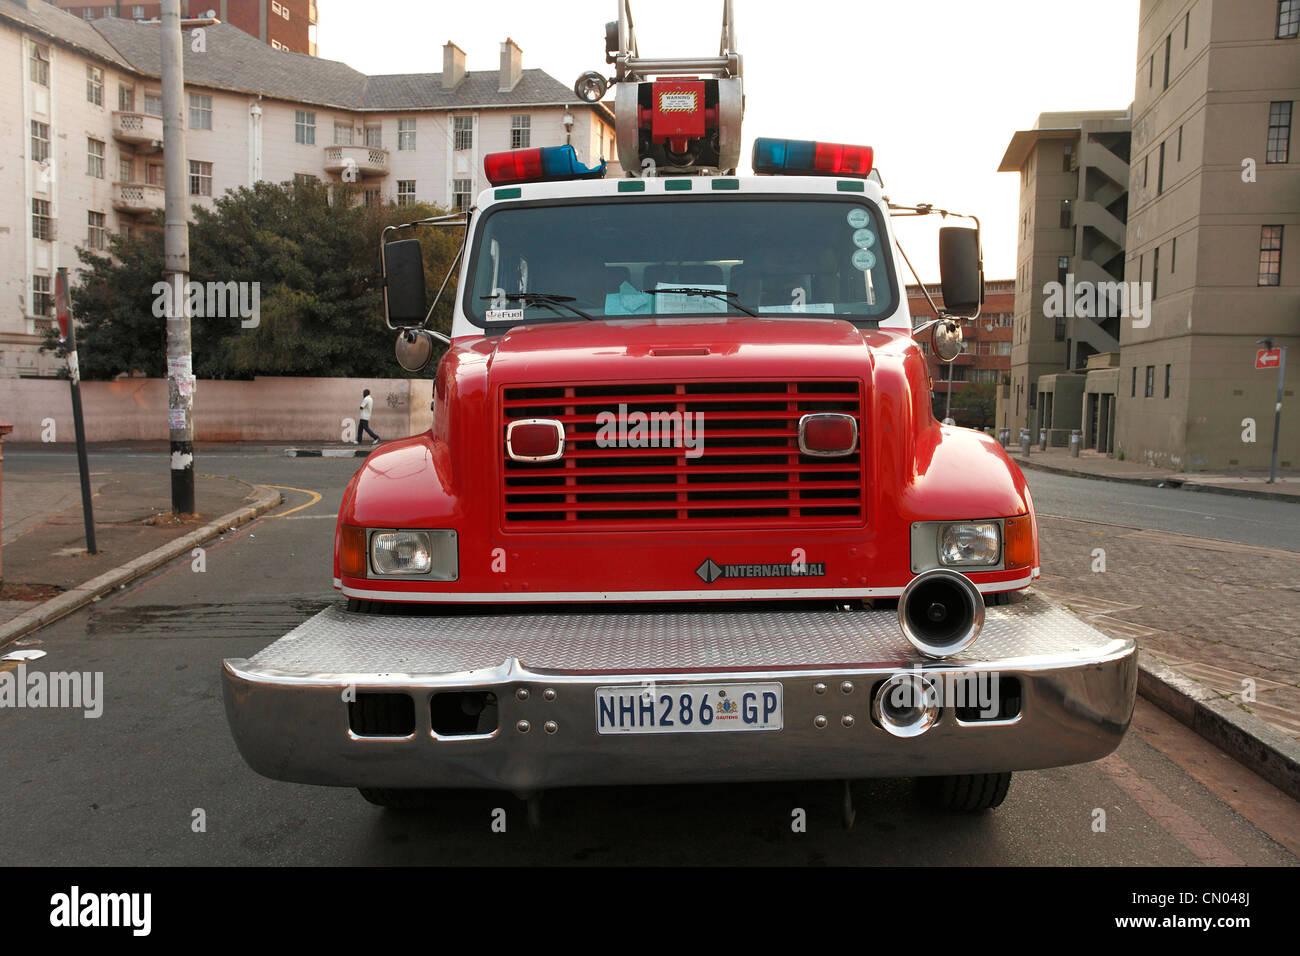 Firetruck in Johannesburg, RSA - Stock Image